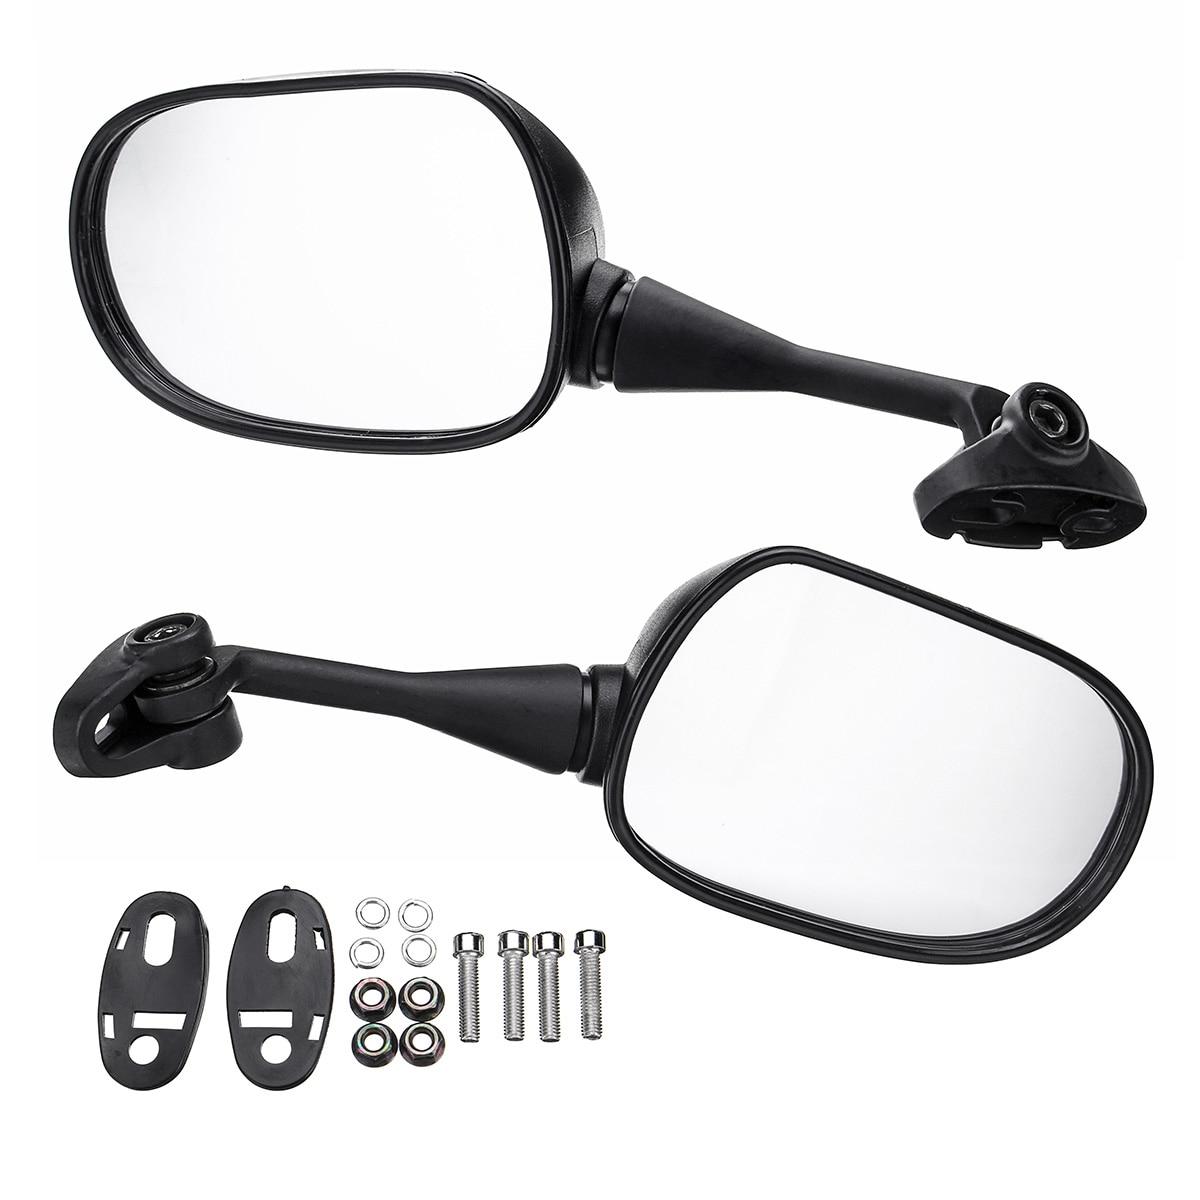 2X 18mm motocykl lusterko wsteczne lusterka szkło tylne lusterko prawe lewe dla Honda CBR600 CBR600RR CBR1000 CBR1000RR